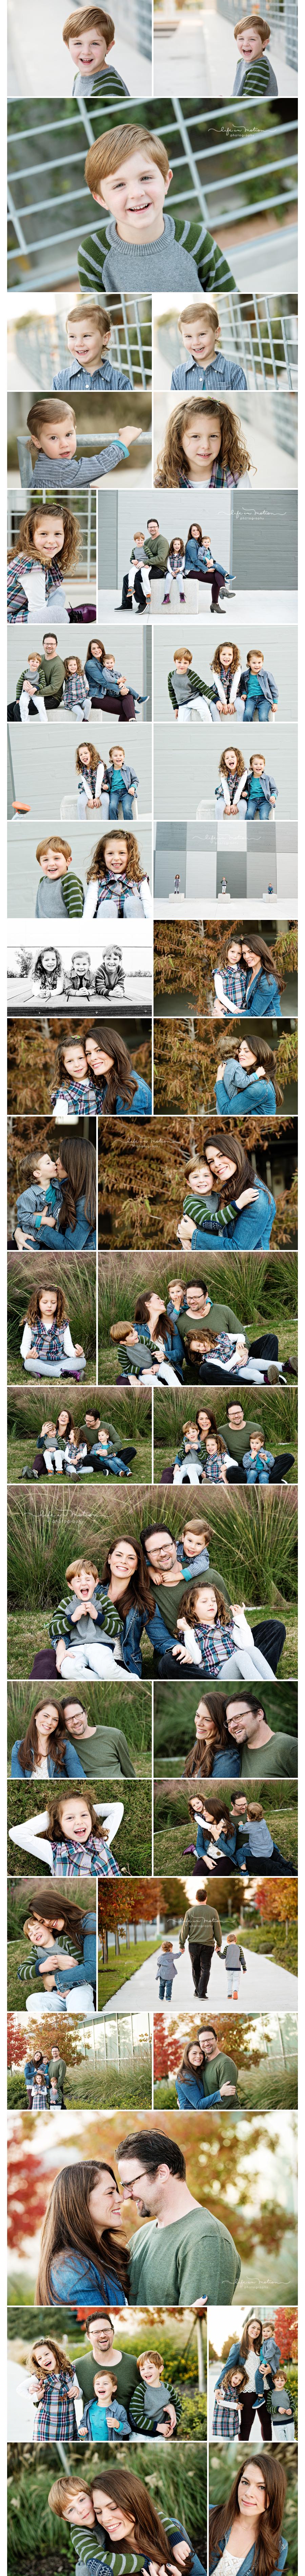 austin_texas_family_photographer